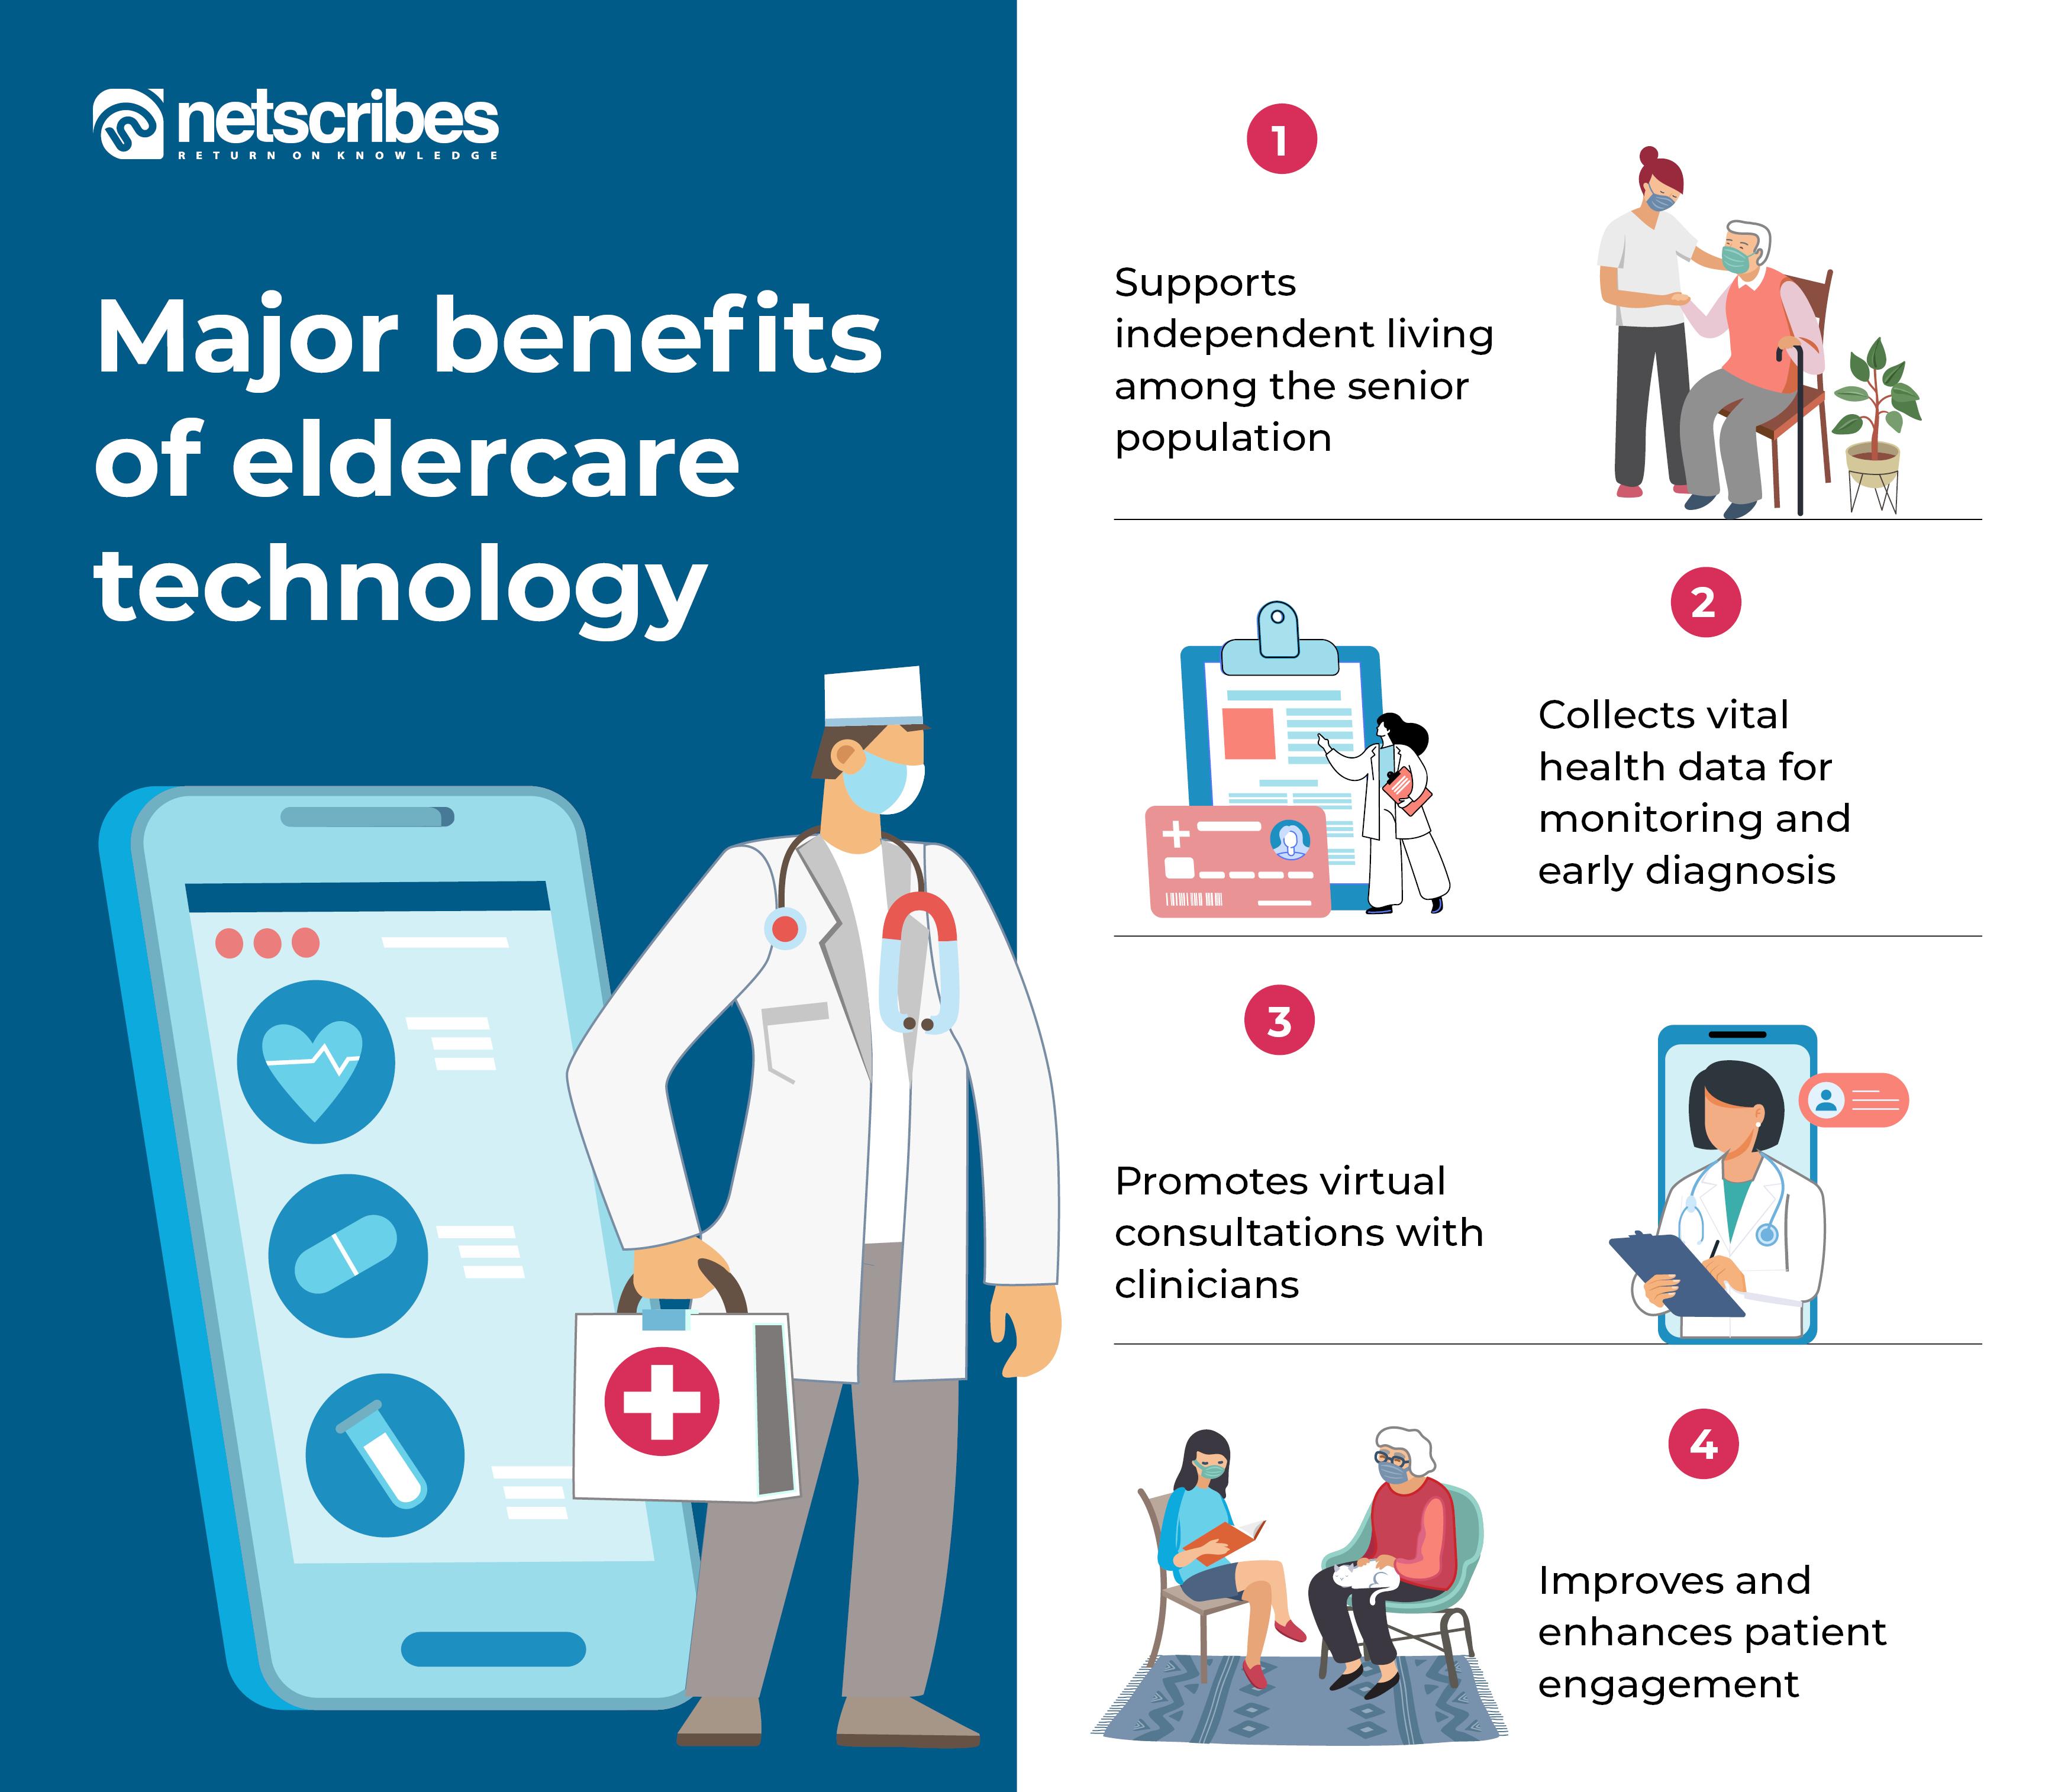 Eldercare technology benefits